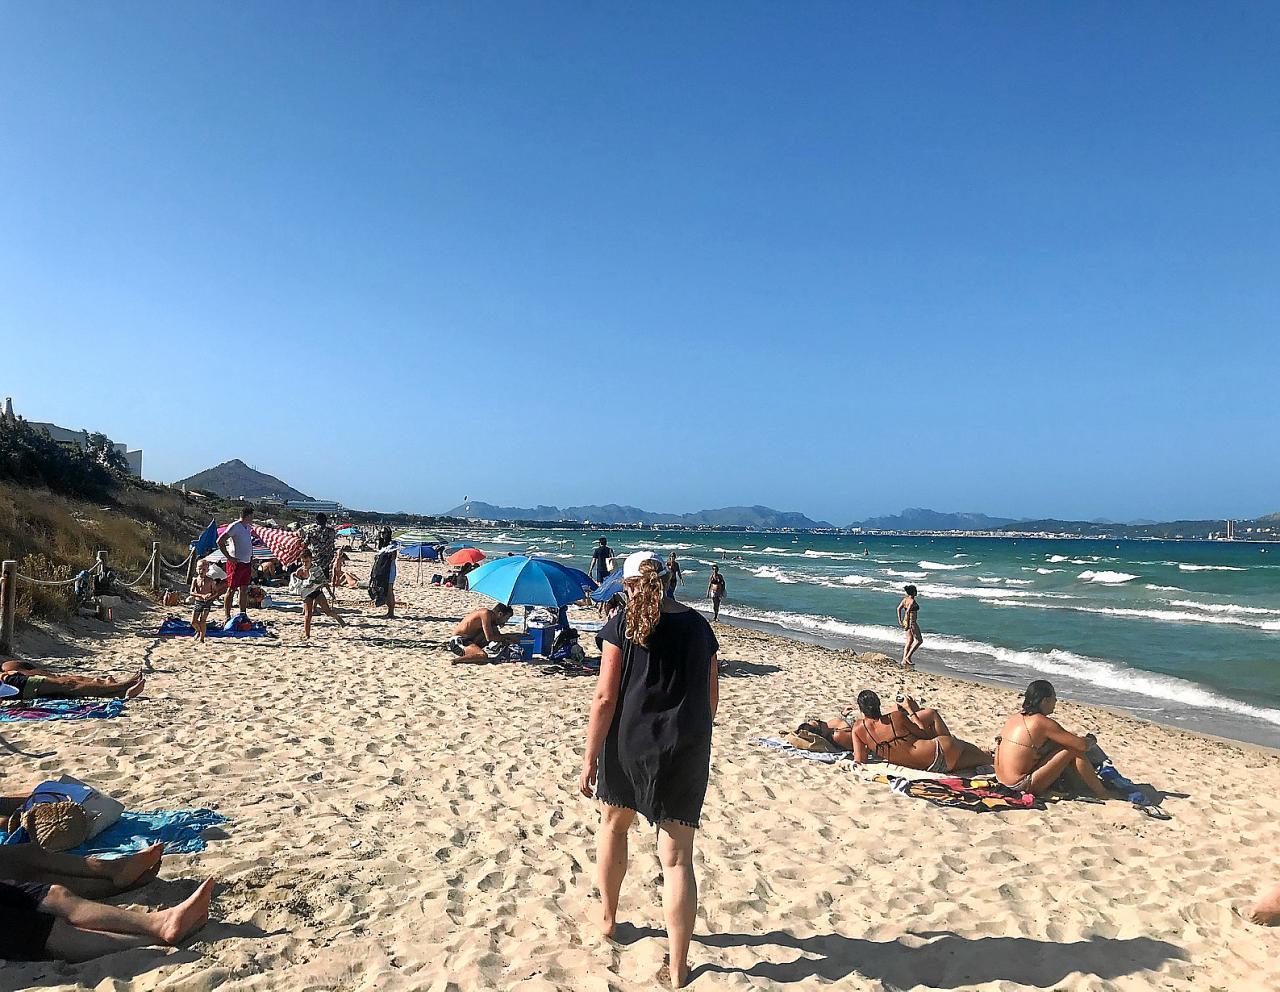 Waves crashing onto a long strip of beach,Truro